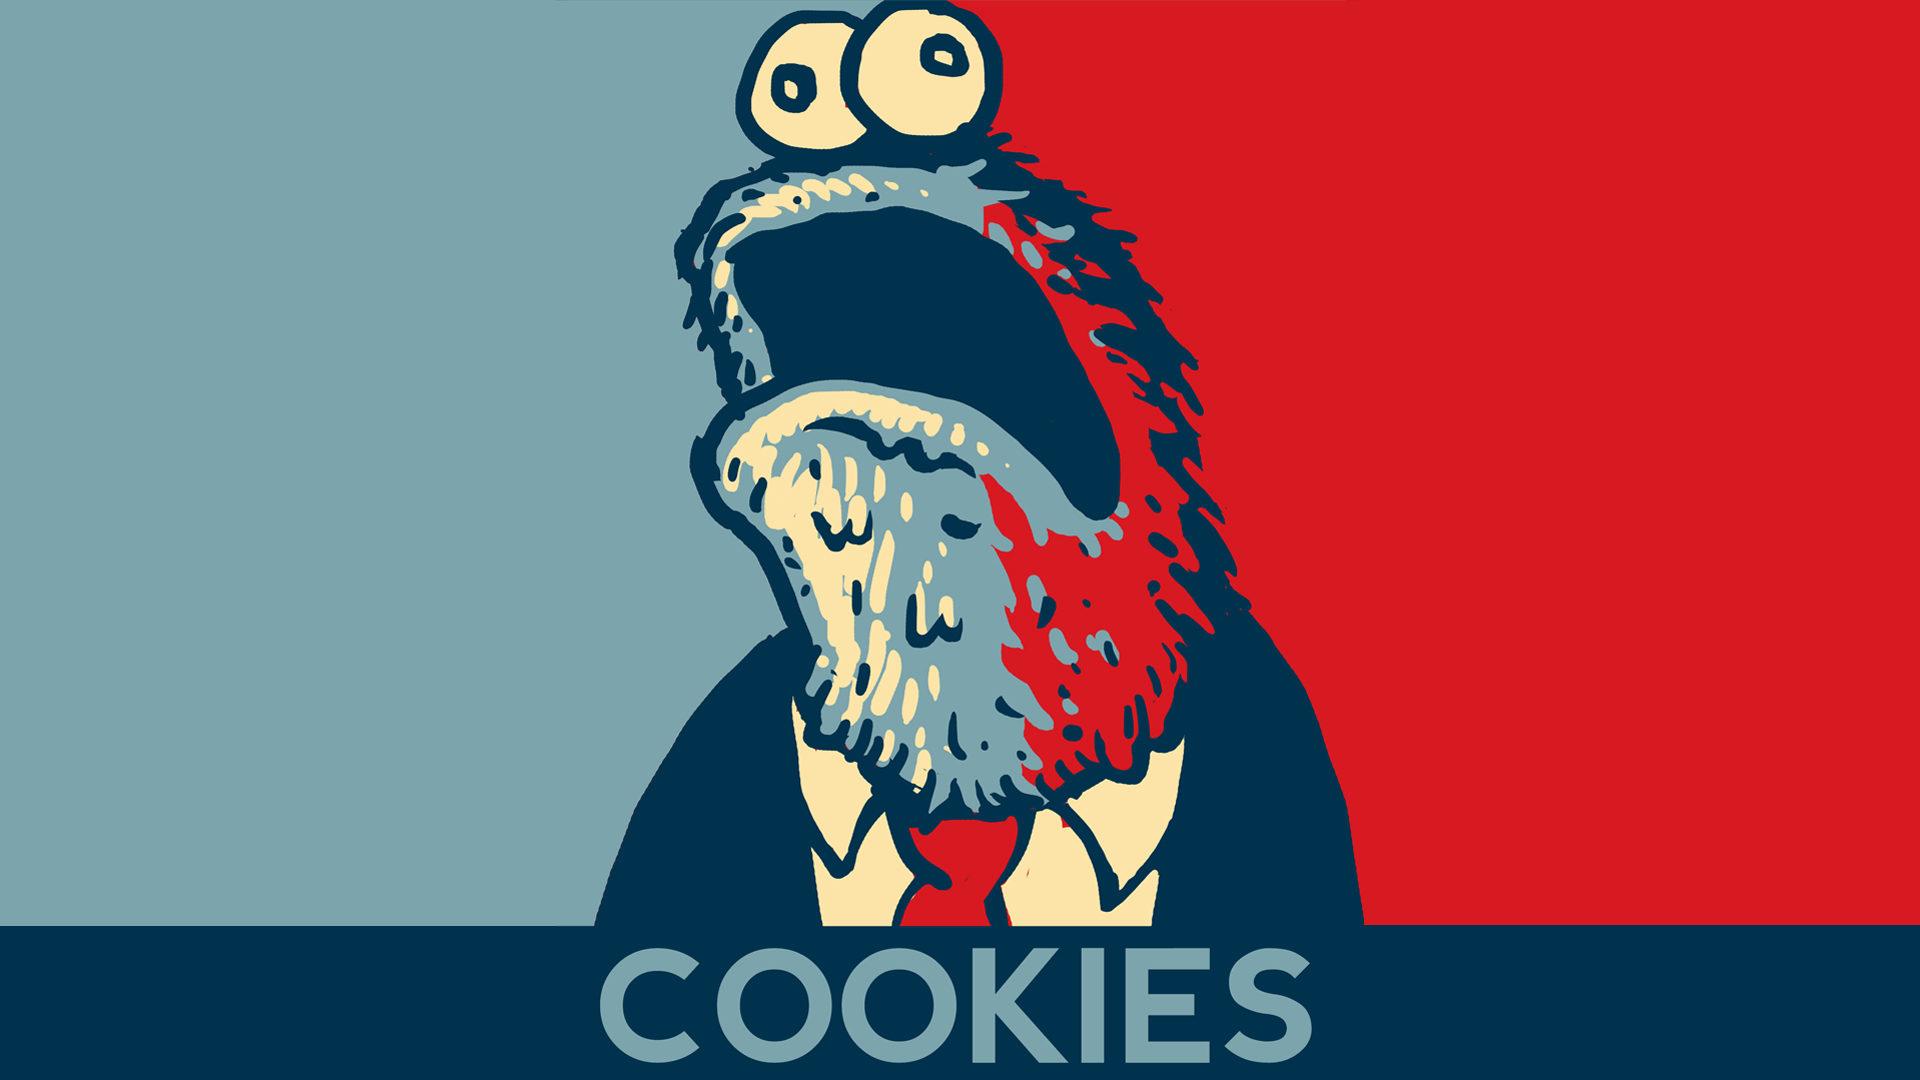 164172818-cookie-monster-wallpapers